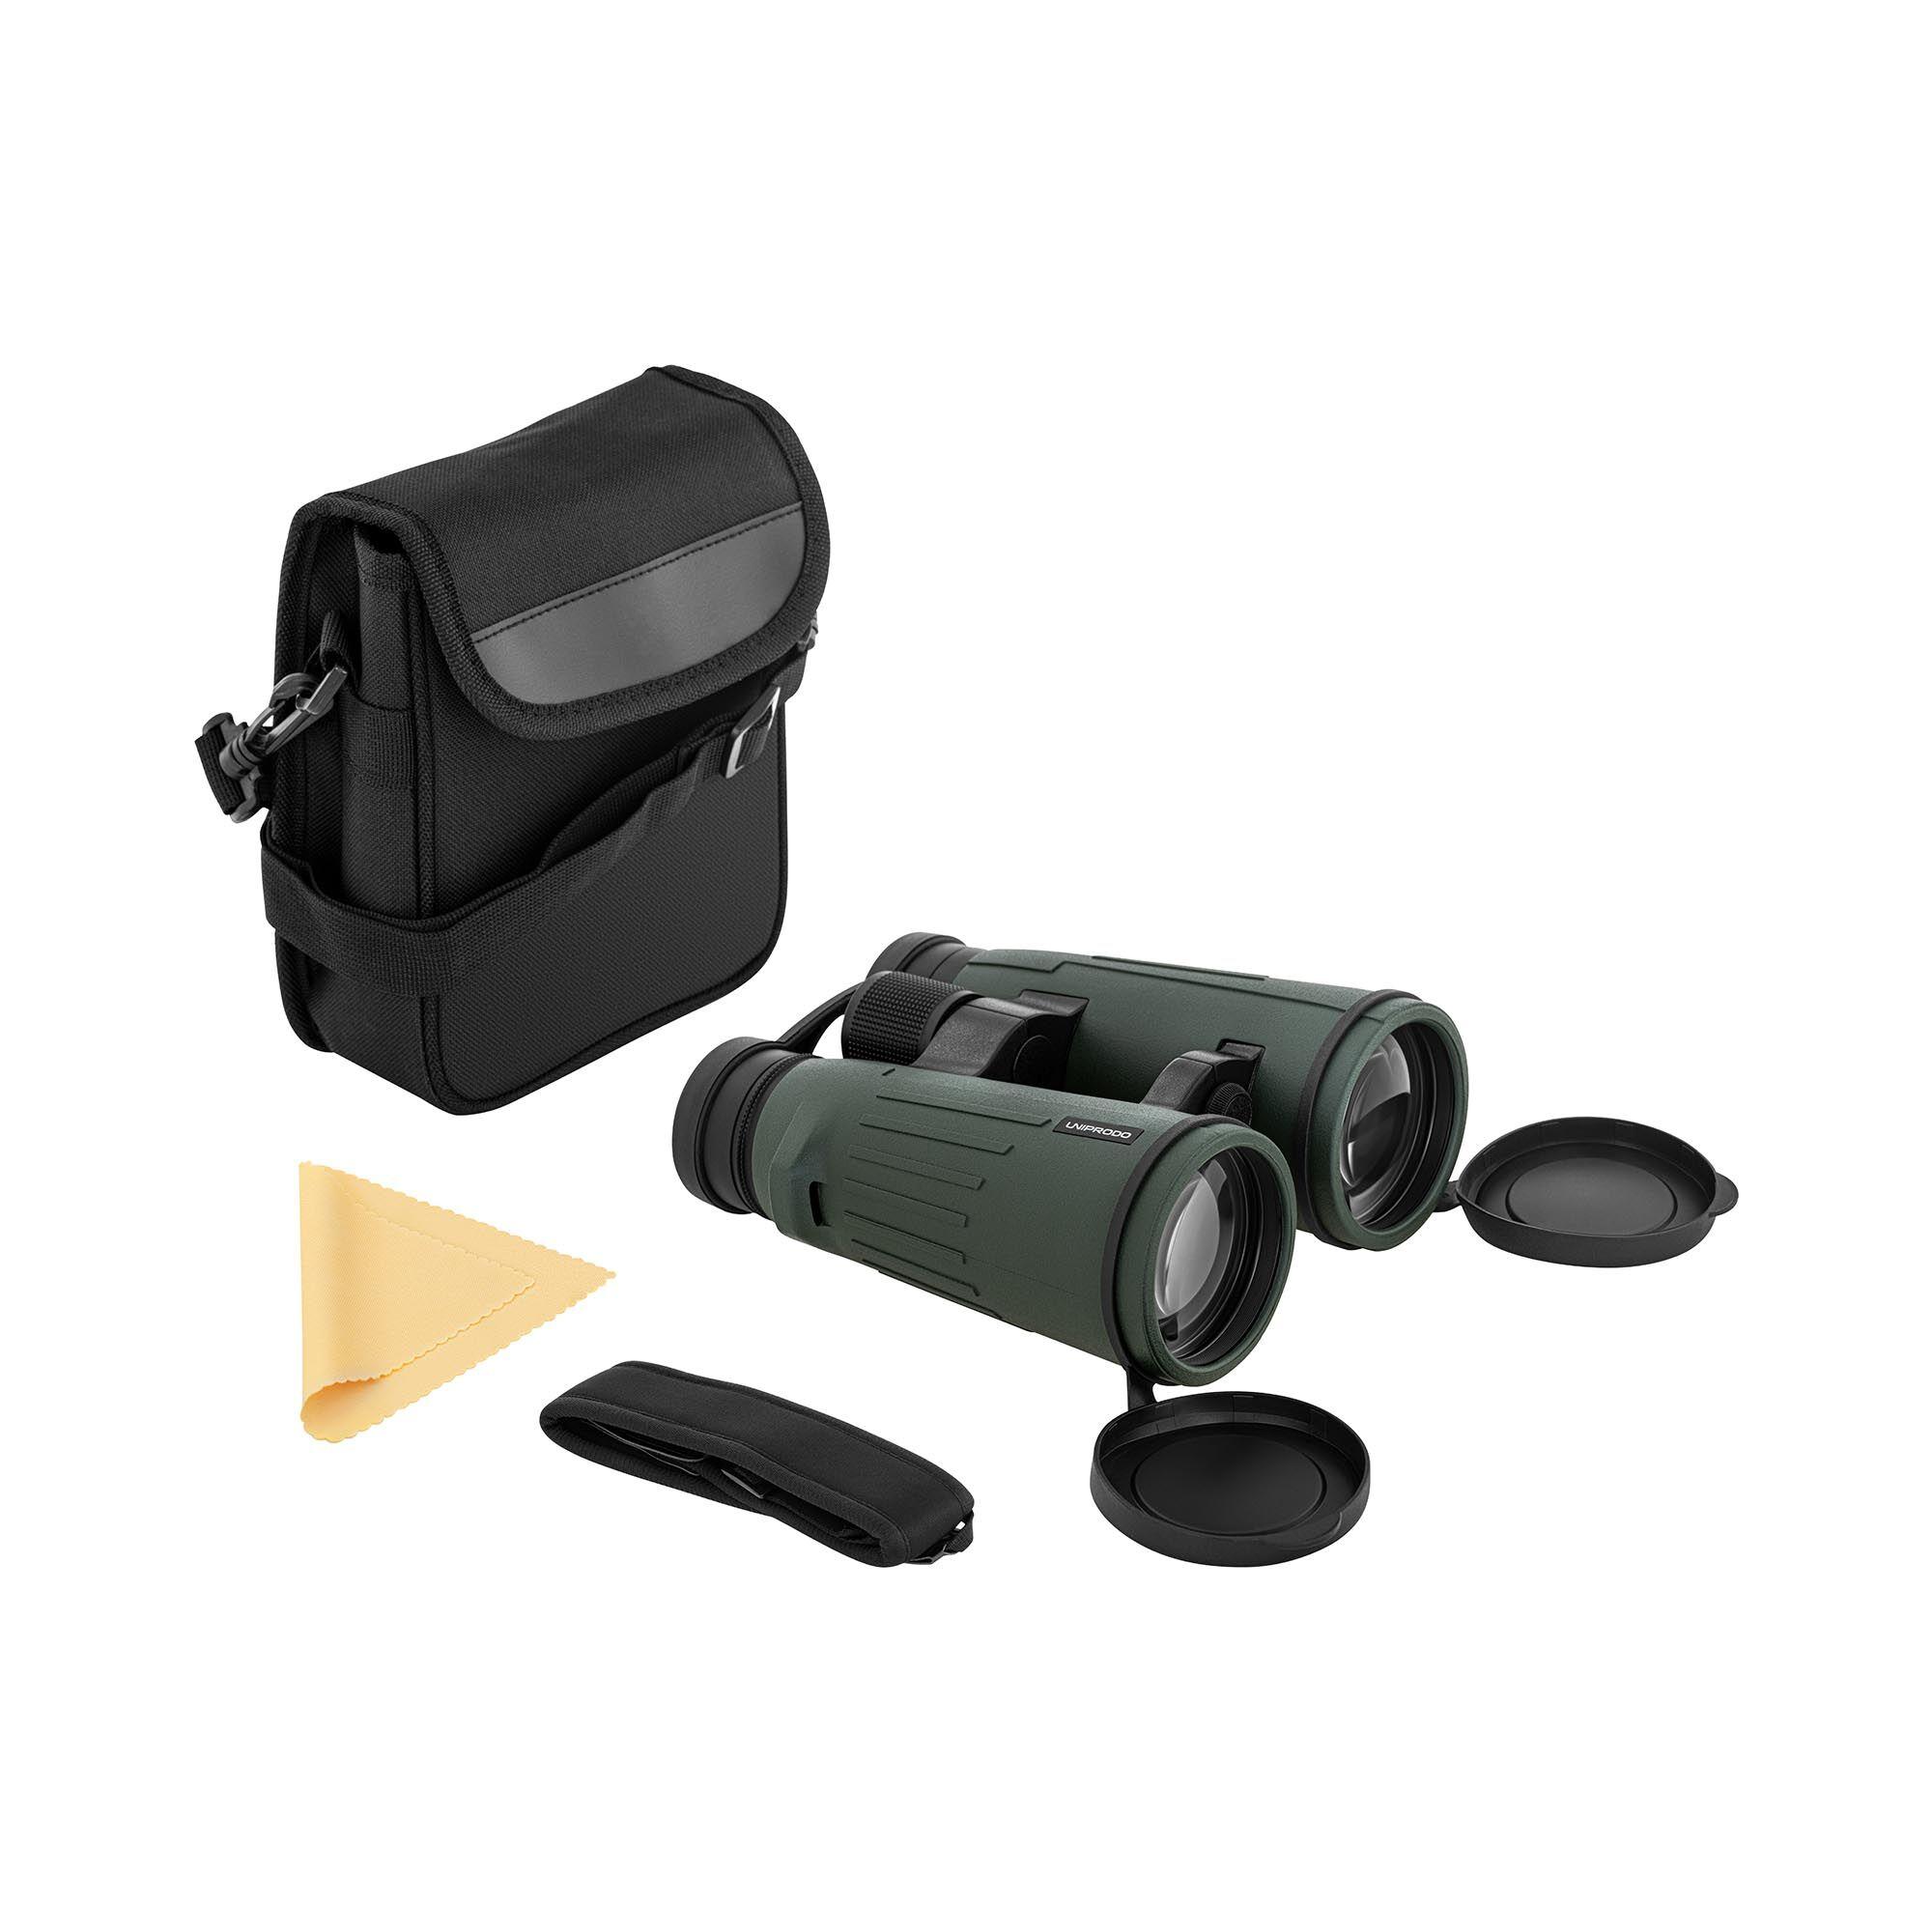 Uniprodo Binoculars - 10x56 - 6.1° - 106 m/1,000 m - BAK-4 - dielectric coating - ED glass UNI_BINOCULAR_10